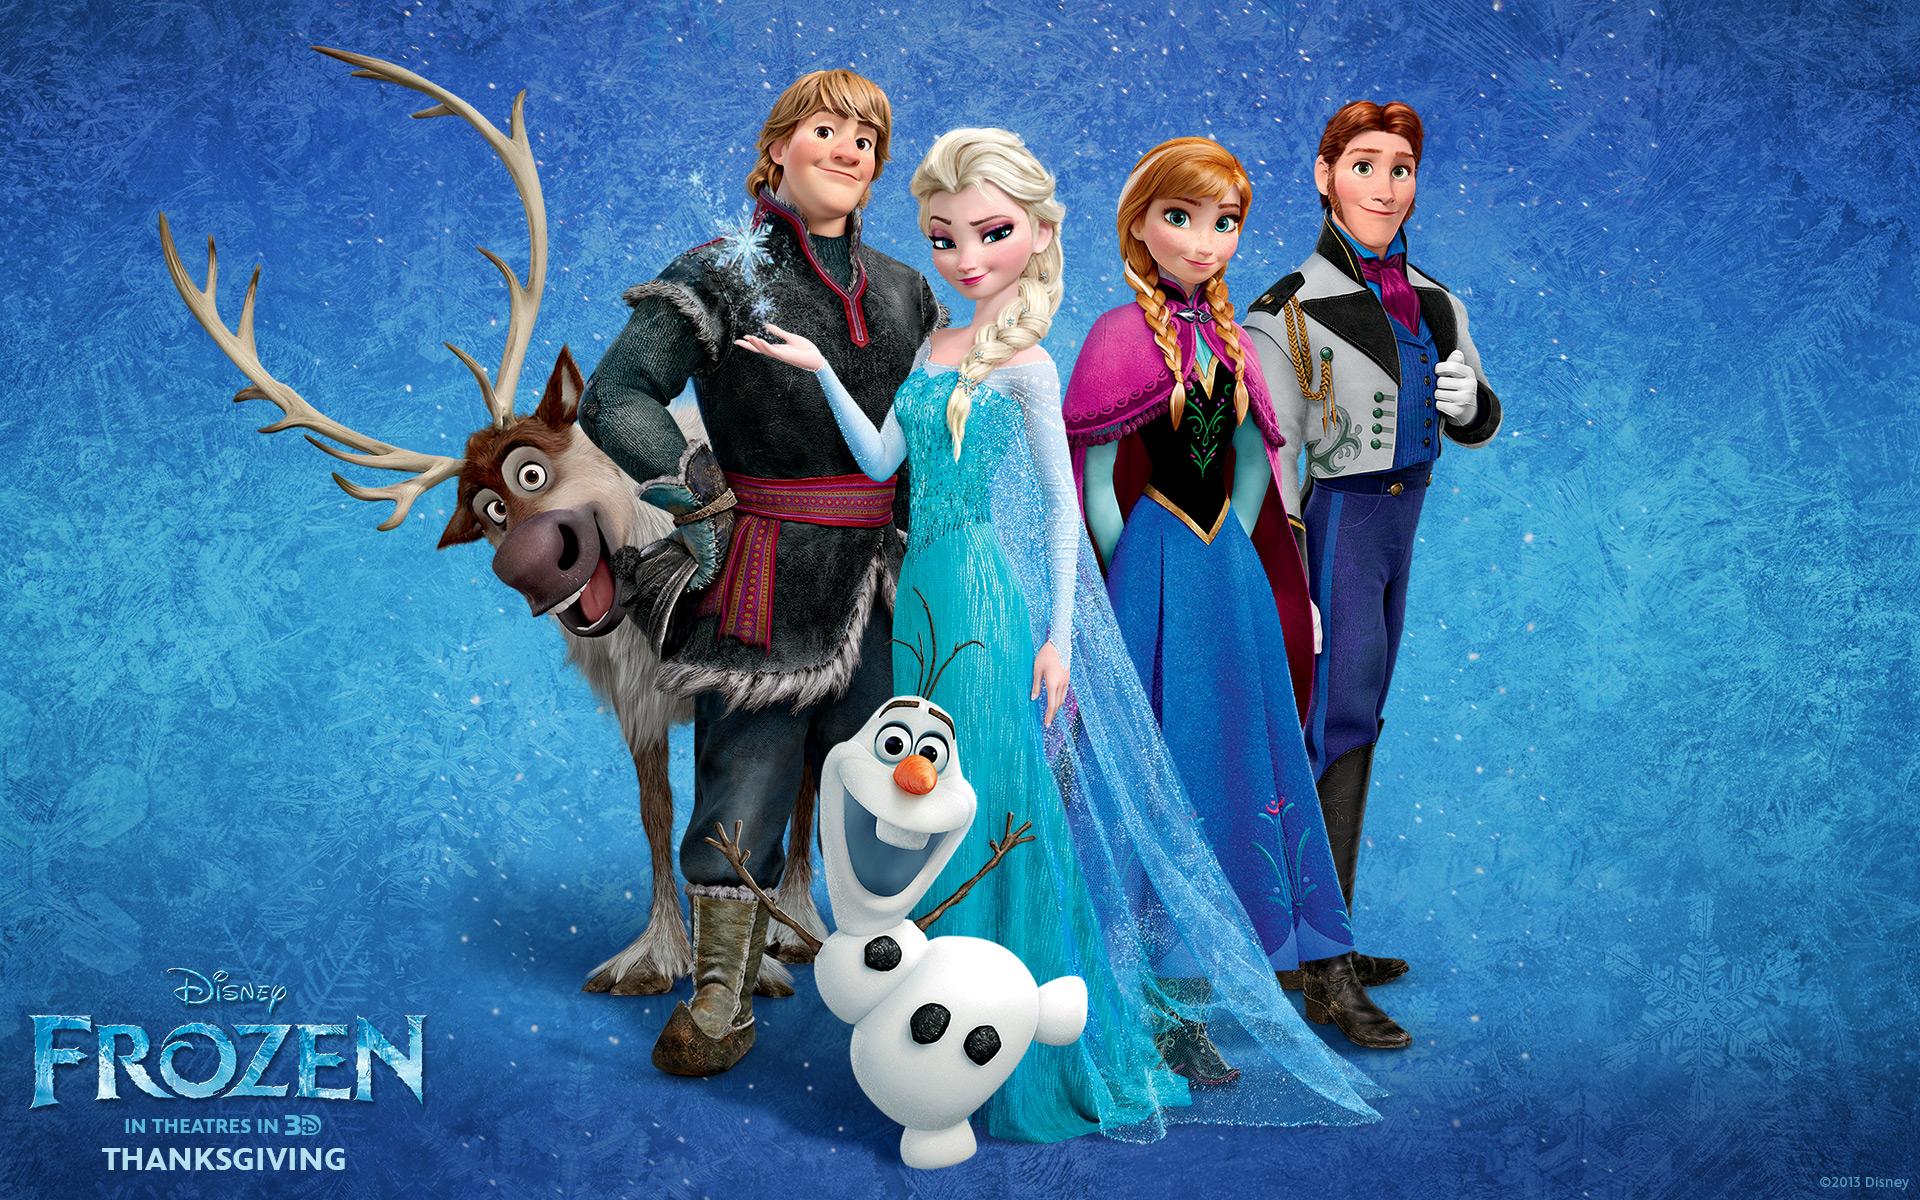 Frozen 2013 Movie Wallpapers HD Wallpapers 1920x1200